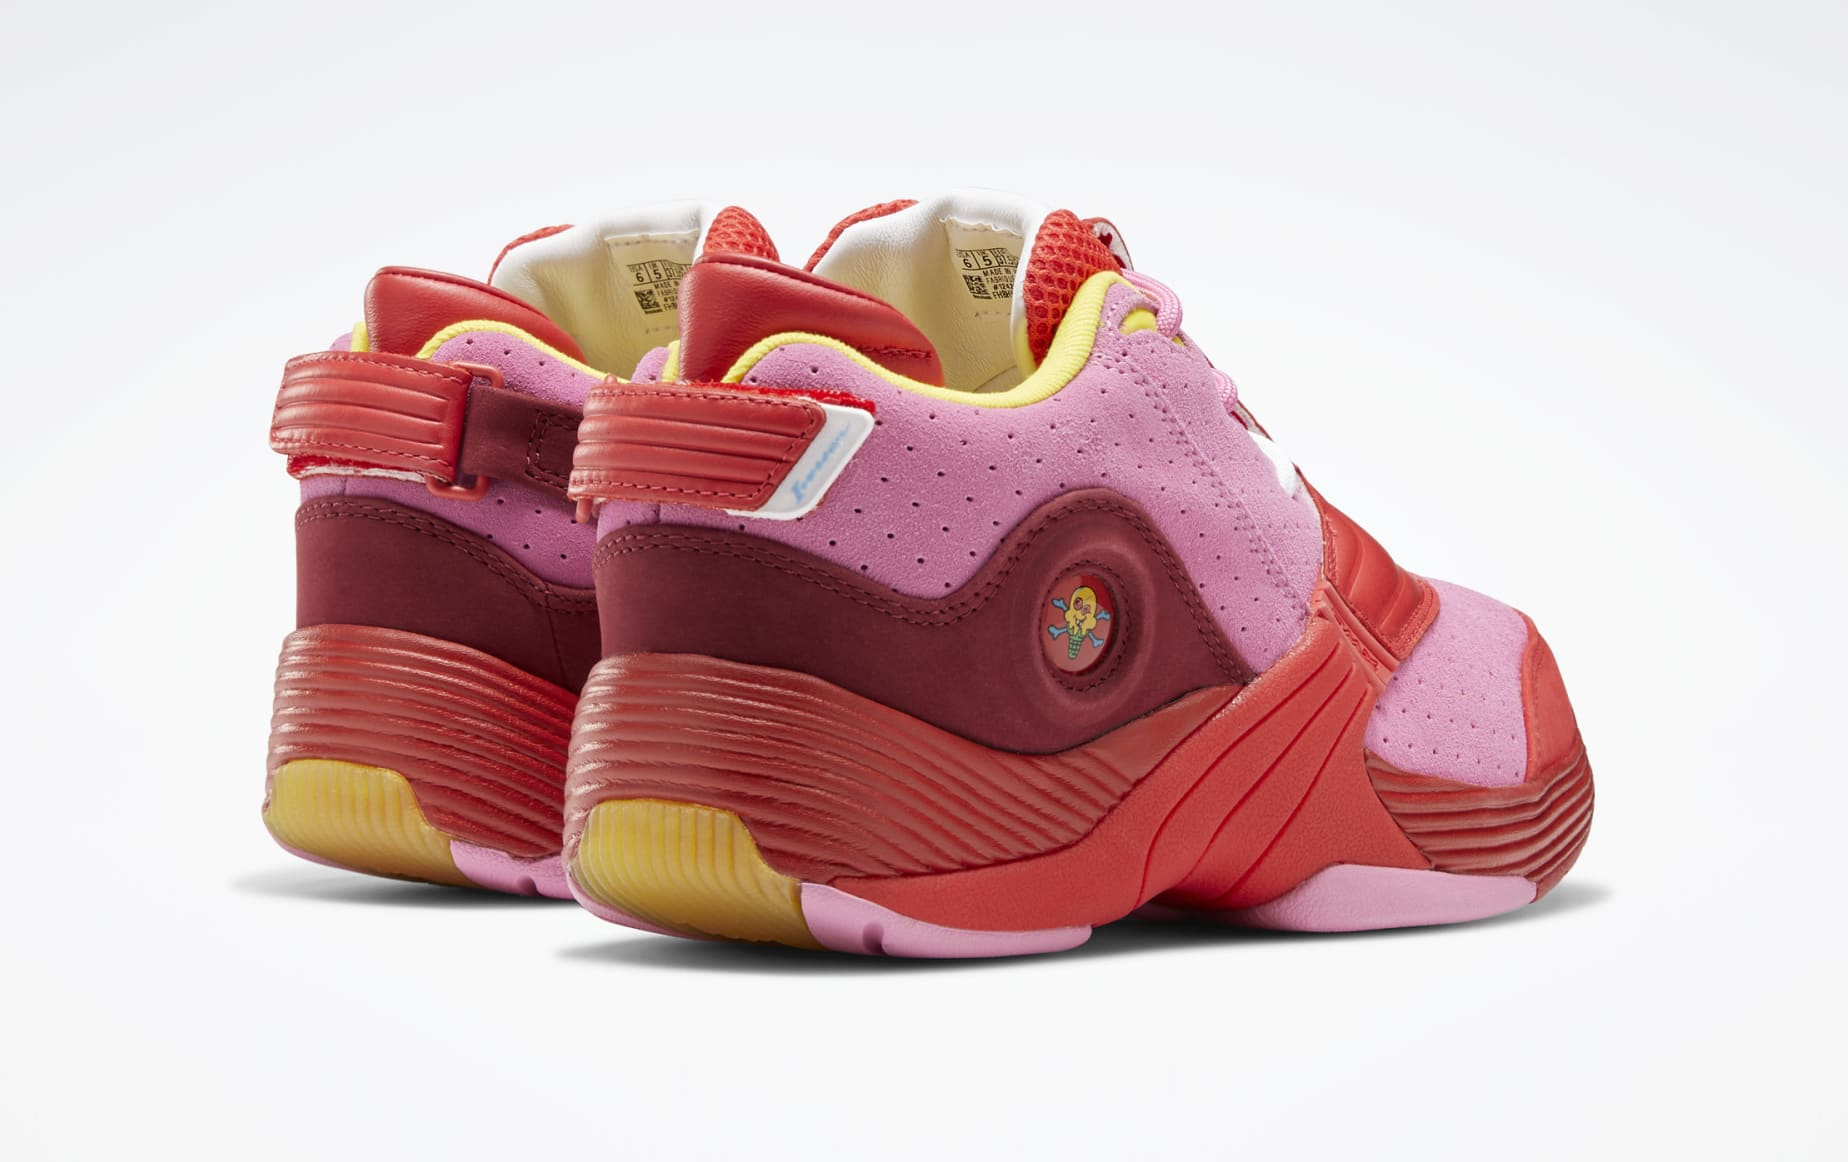 bbc-ice-cream-reebok-answer-v-cherry-tomato-posh-pink-stinger-yellow-fw7505-heel